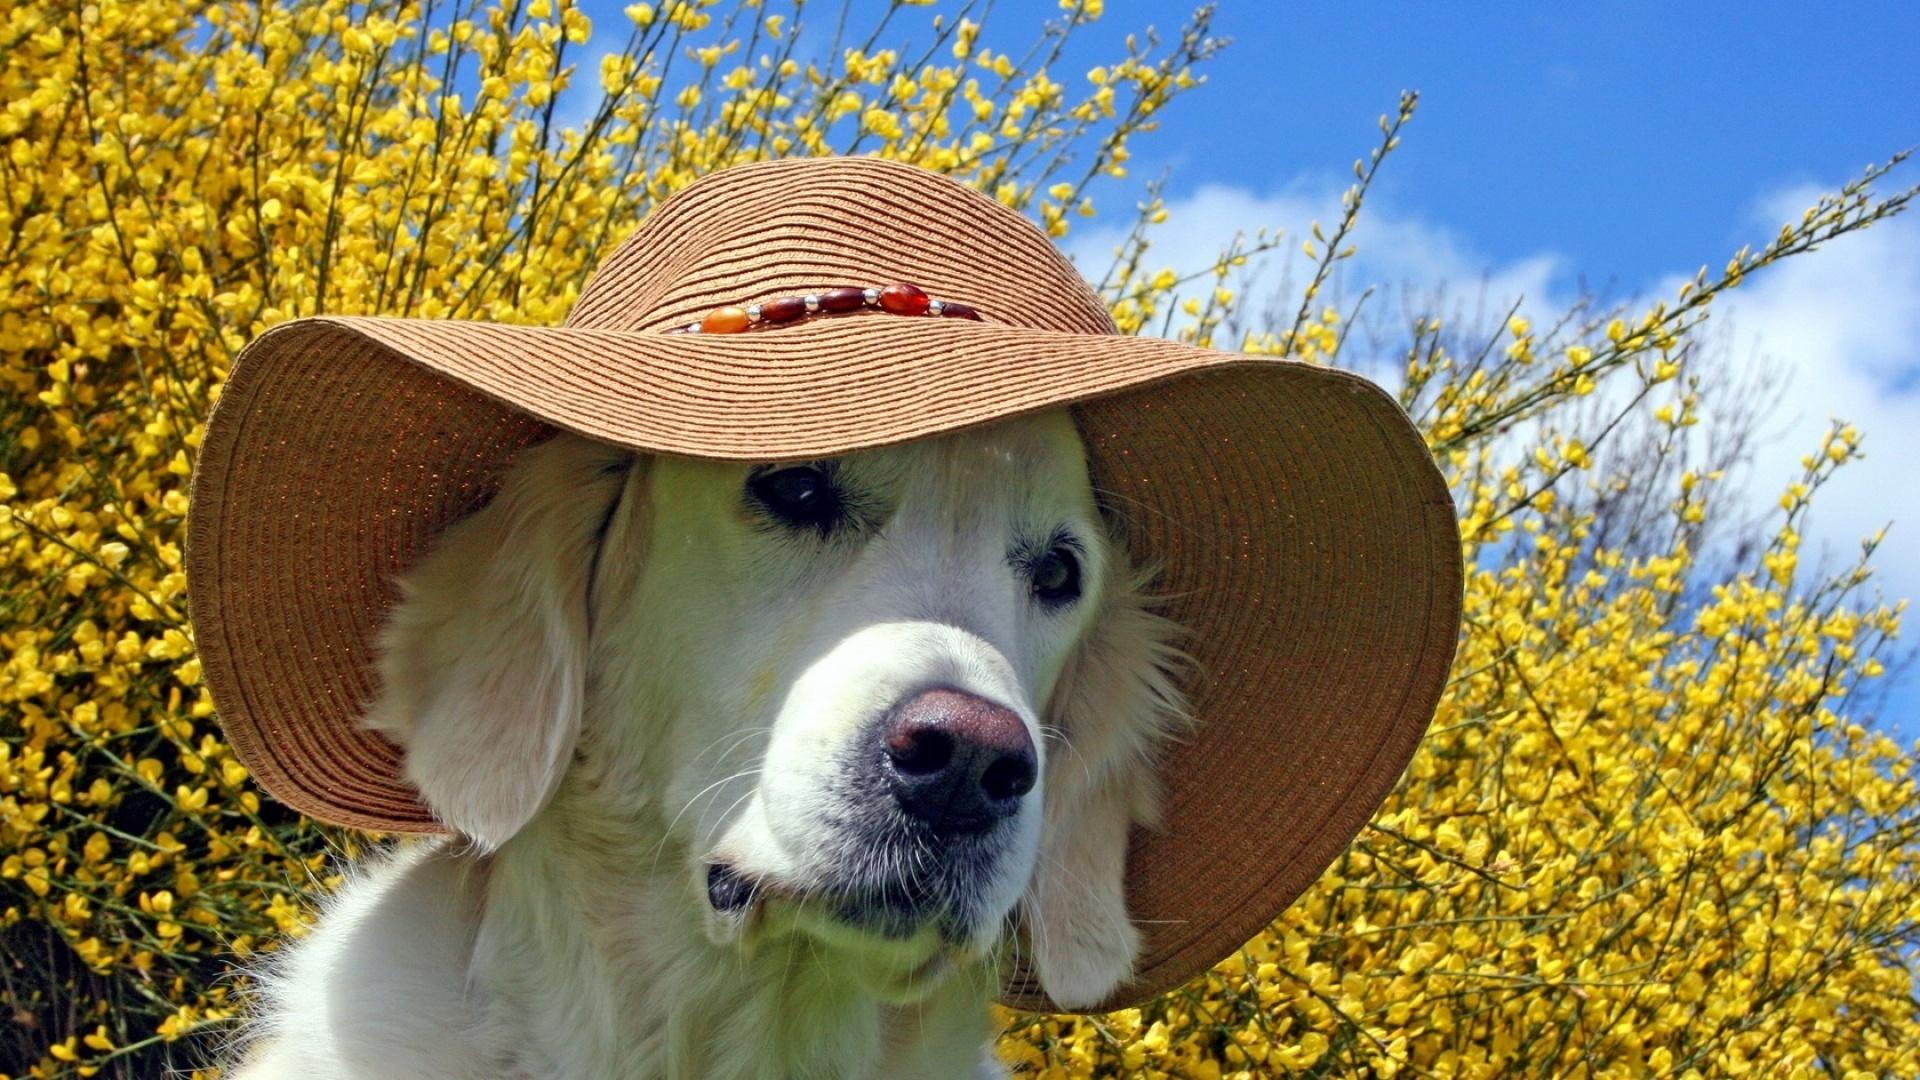 солнышко и собачку картинка главной странице